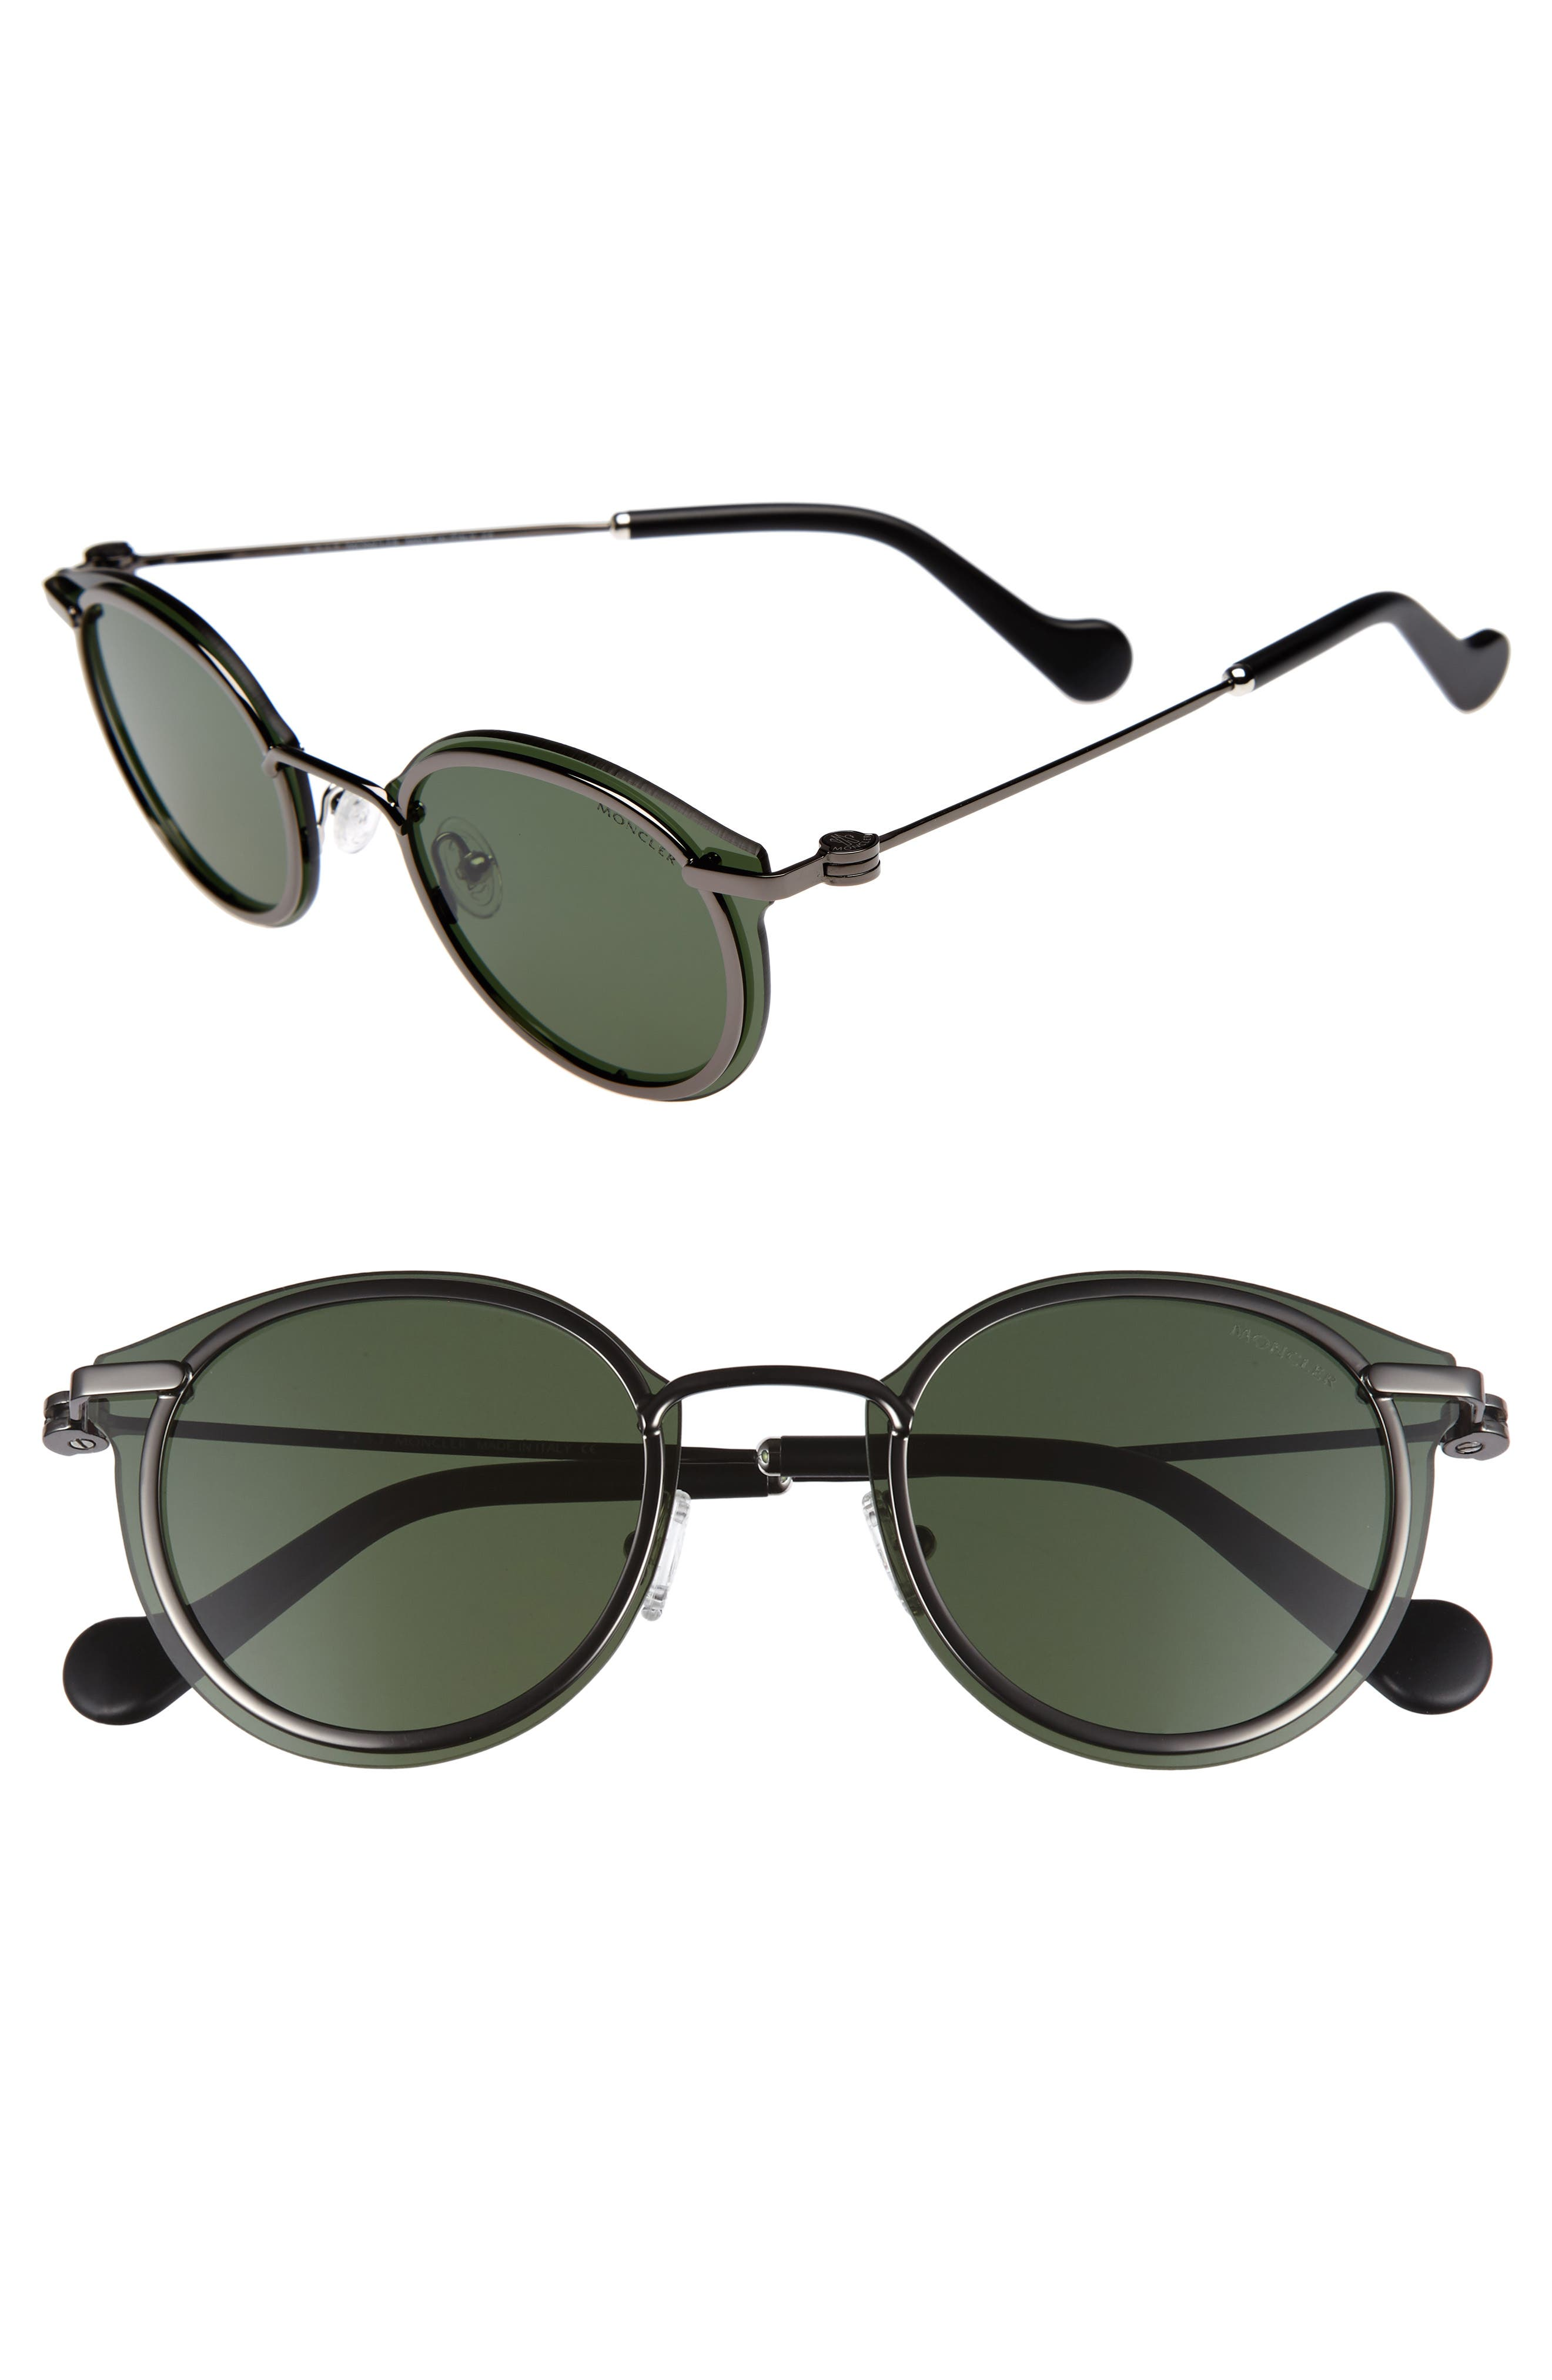 Main Image - Moncler 58mm Mirrored Round Sunglasses